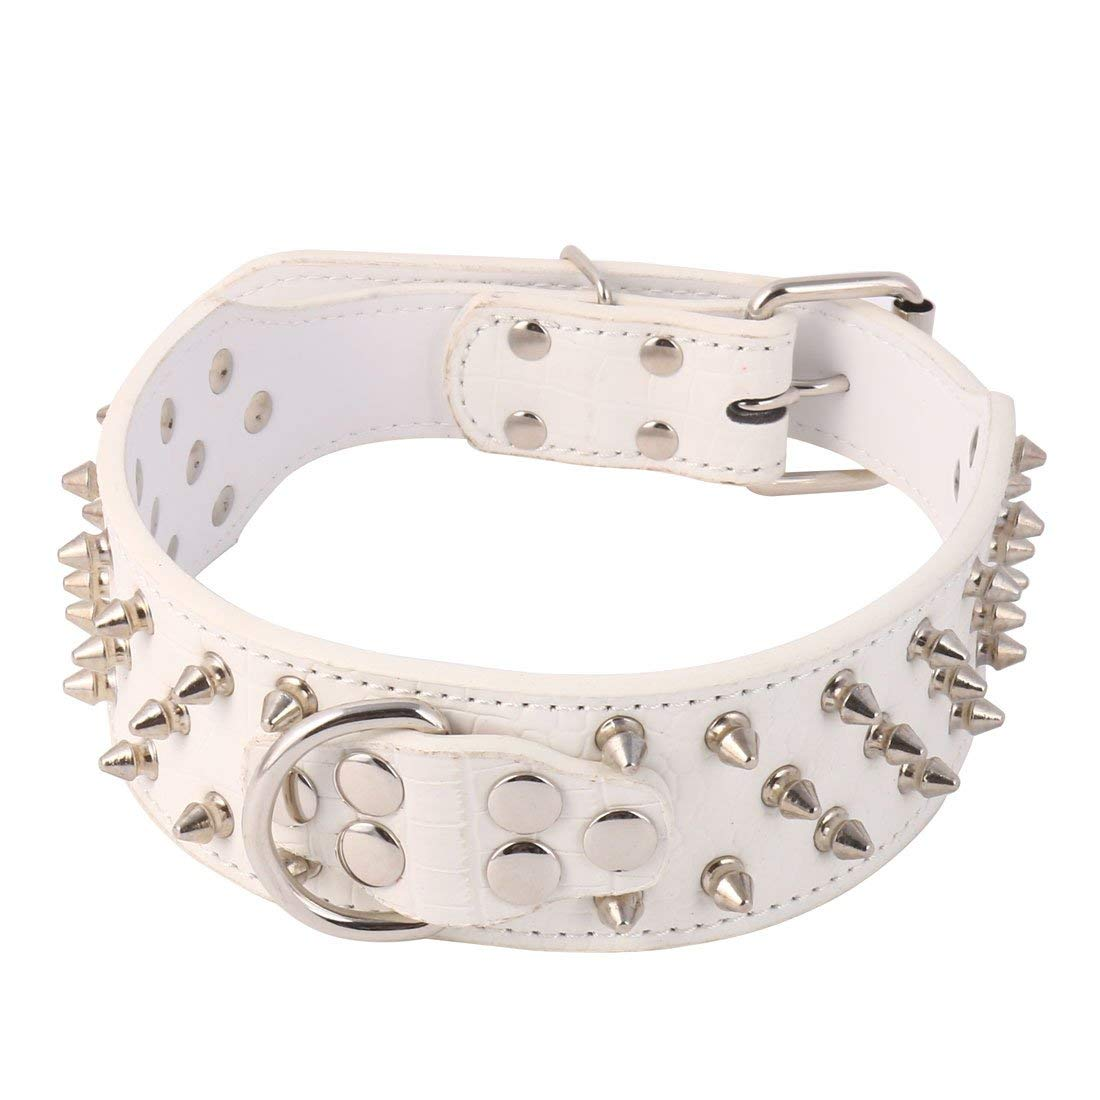 PU Leather Walking 3 Row Rivet Spike Studs Design Adjustable Pet Dog Neck Strap Collar